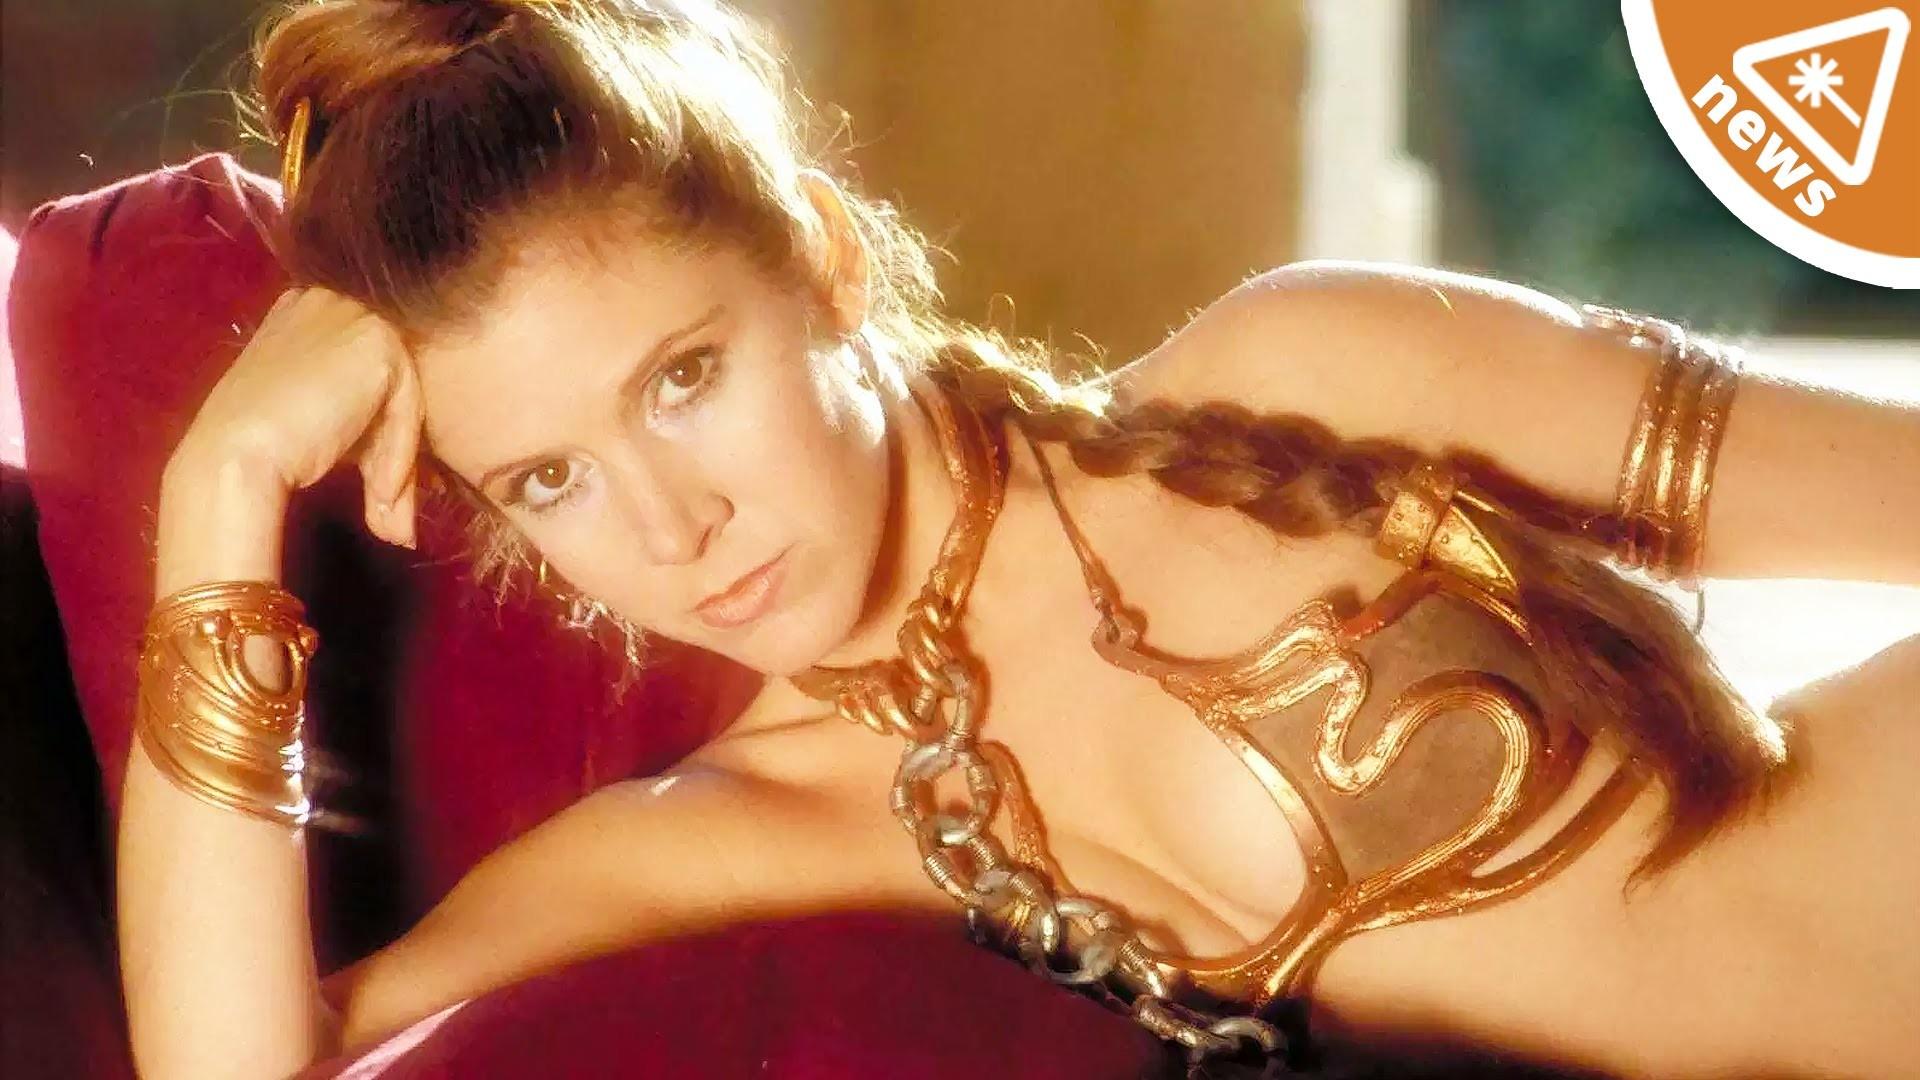 Res: 1920x1080, Say Goodbye to Slave Leia from Star Wars! (Nerdist News w/ Jessica Chobot)  - YouTube